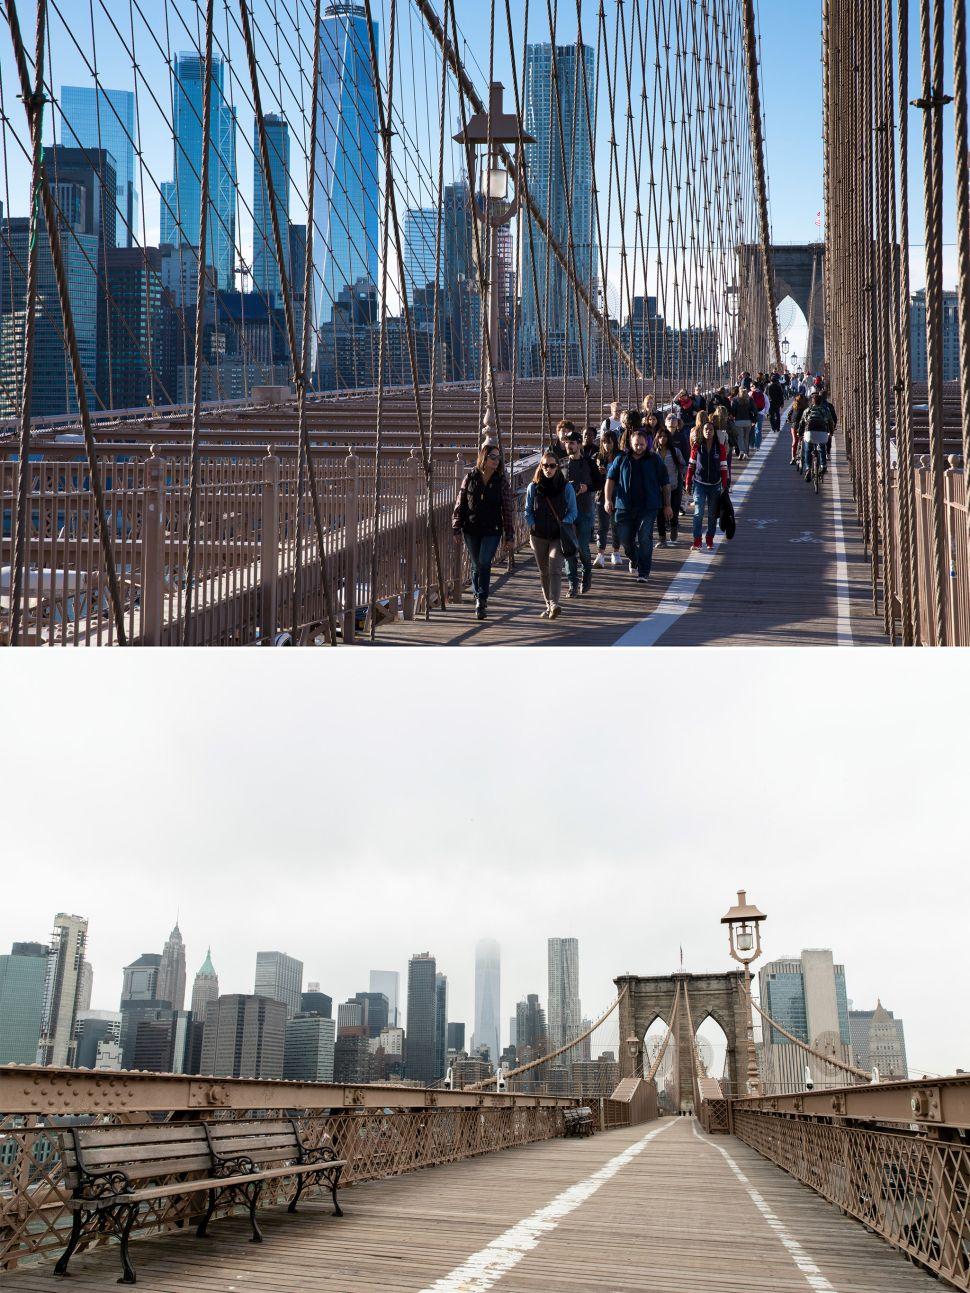 Brooklyn Bridge before and after coronavirus